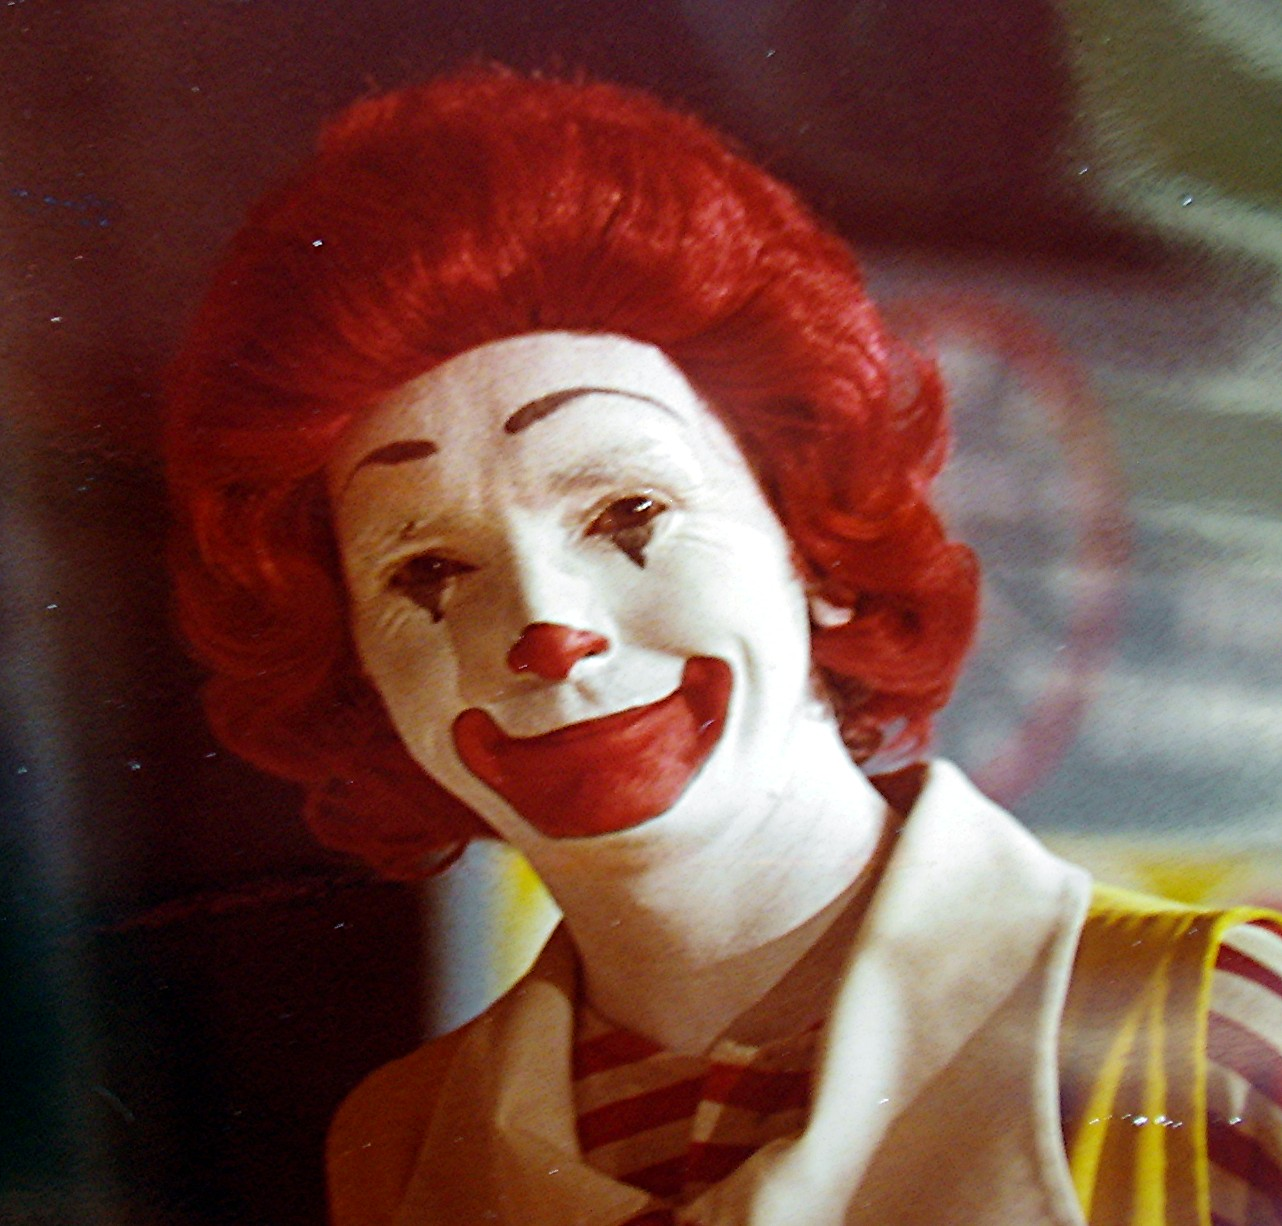 Its Ronald